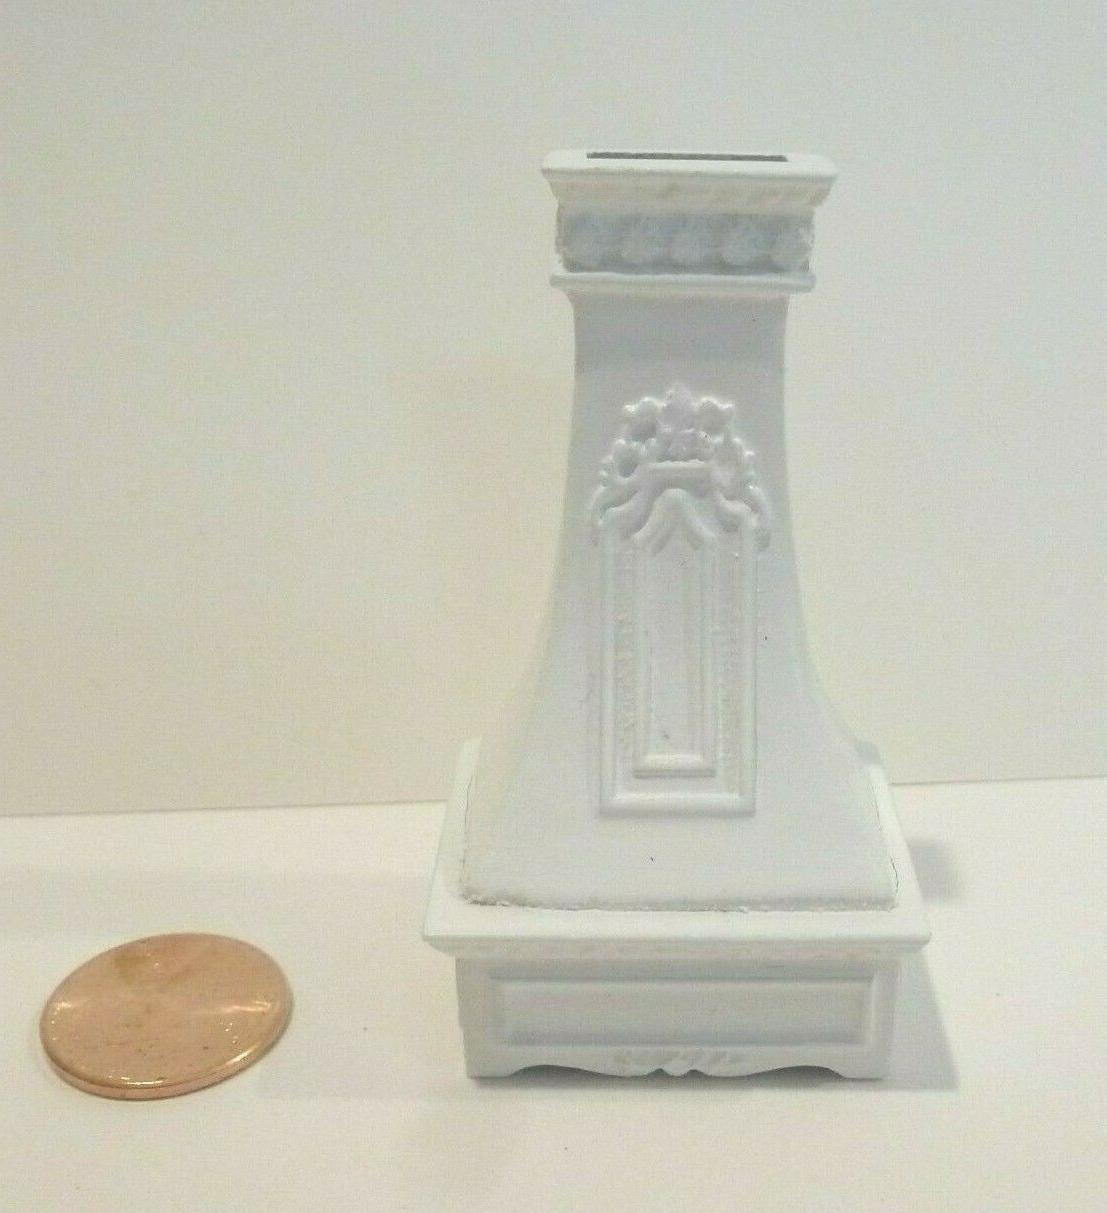 miniature 1 2 scale miss julia range